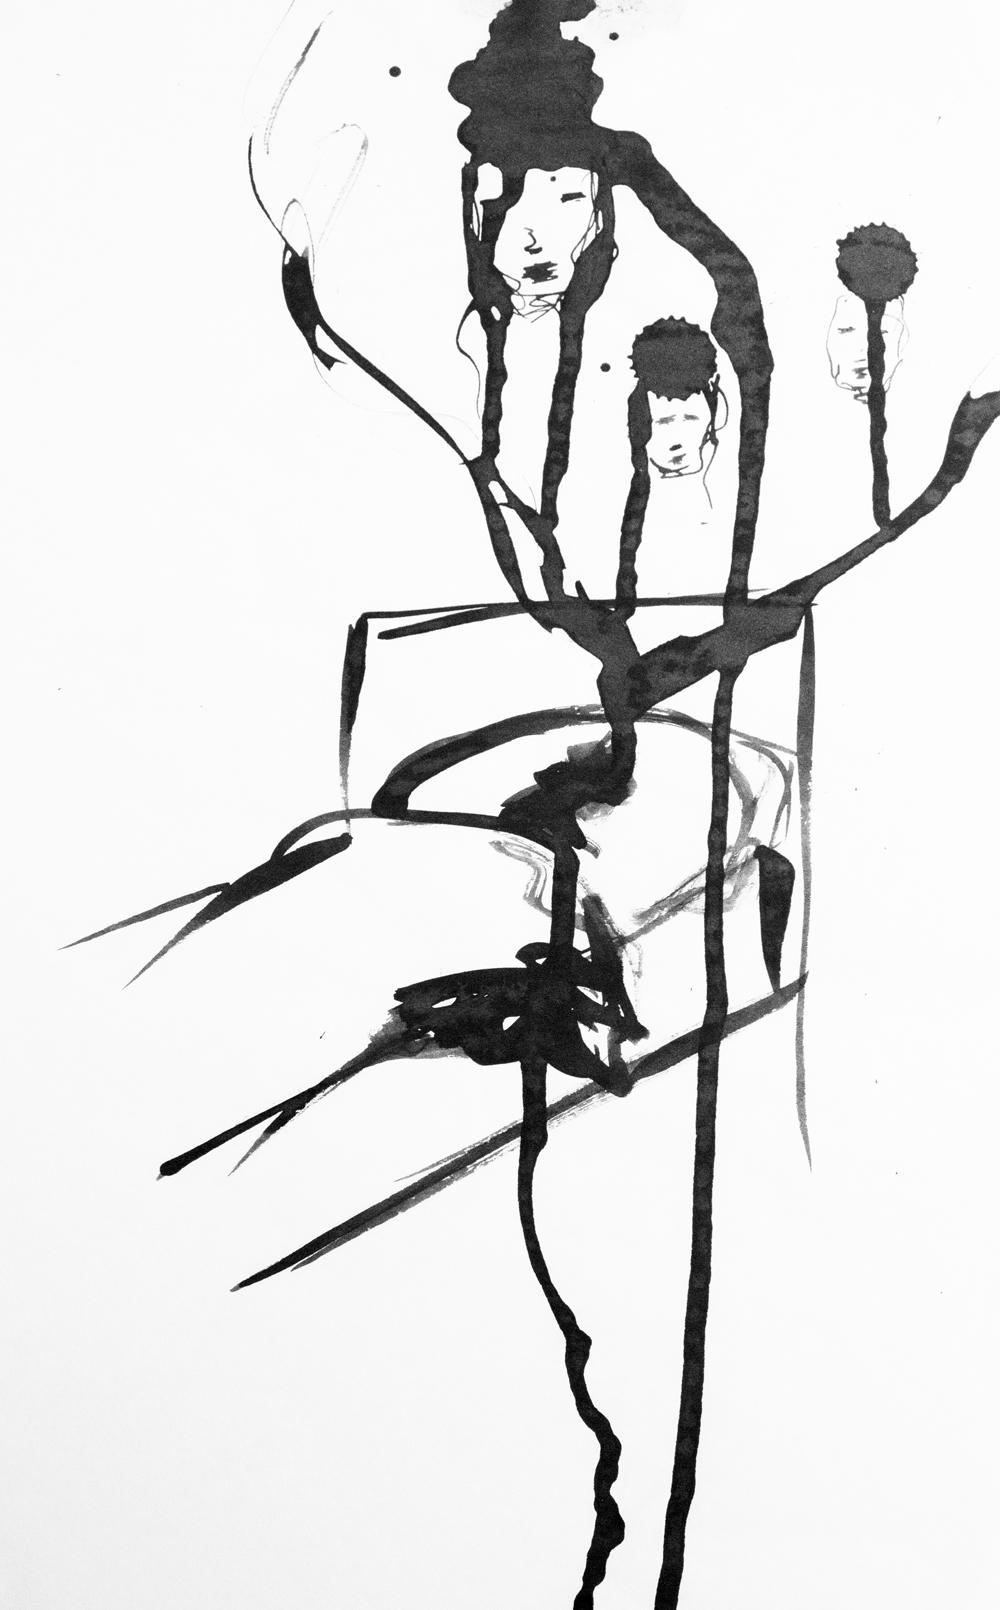 '22.9.2010'artwork,inc.fineartist.kerstinpressler.com